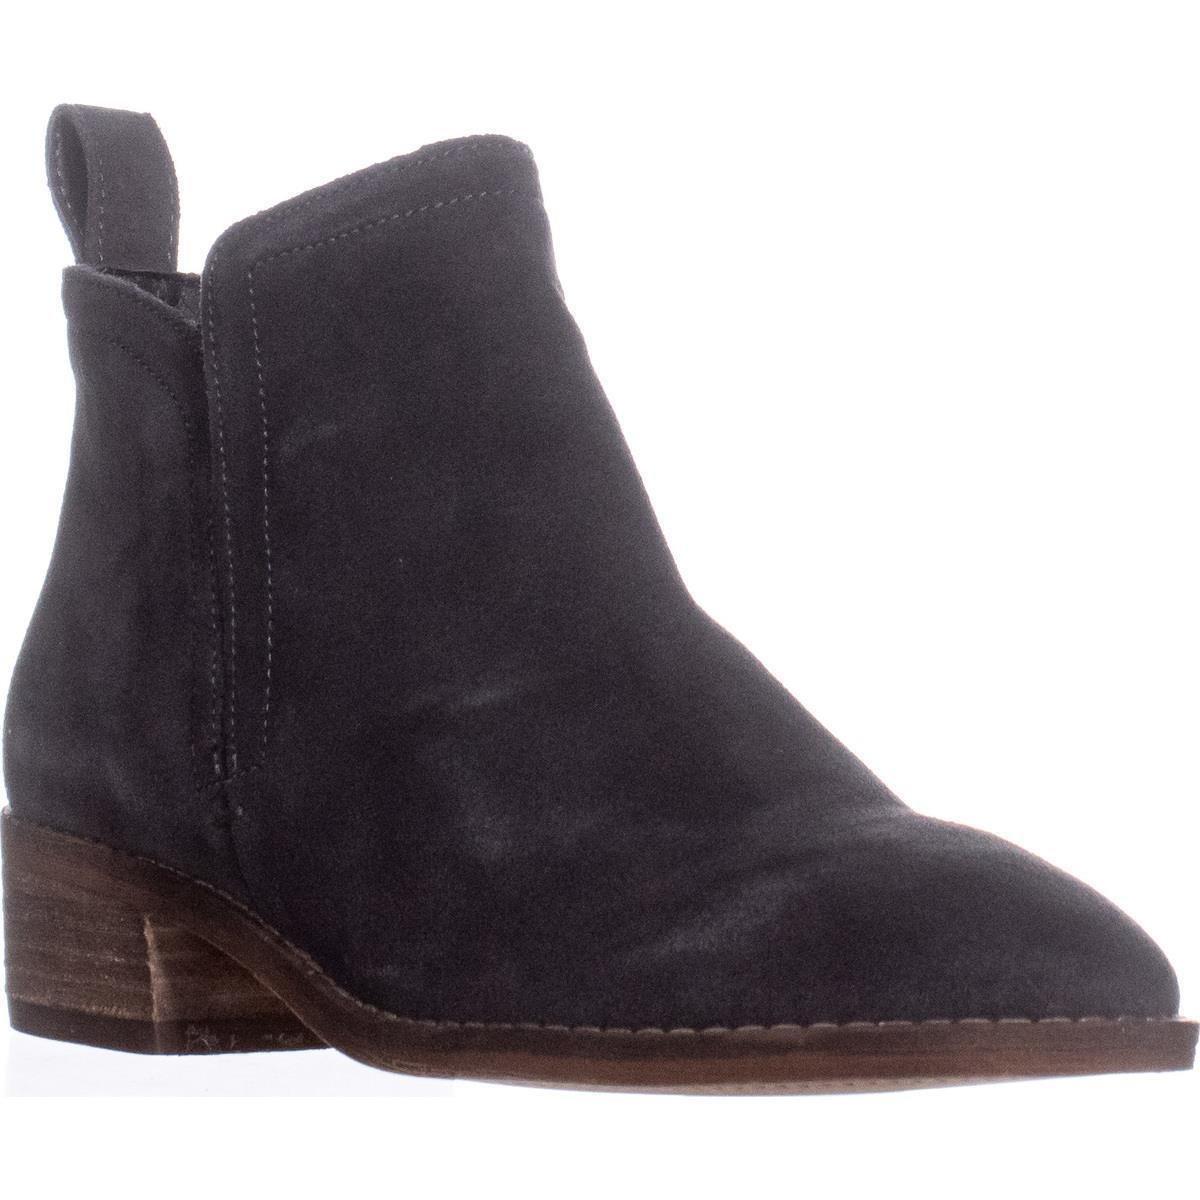 Dolce Vita Women's Tessey Boot B01D2SNIOG 11 B(M) US|Anthracite Suede